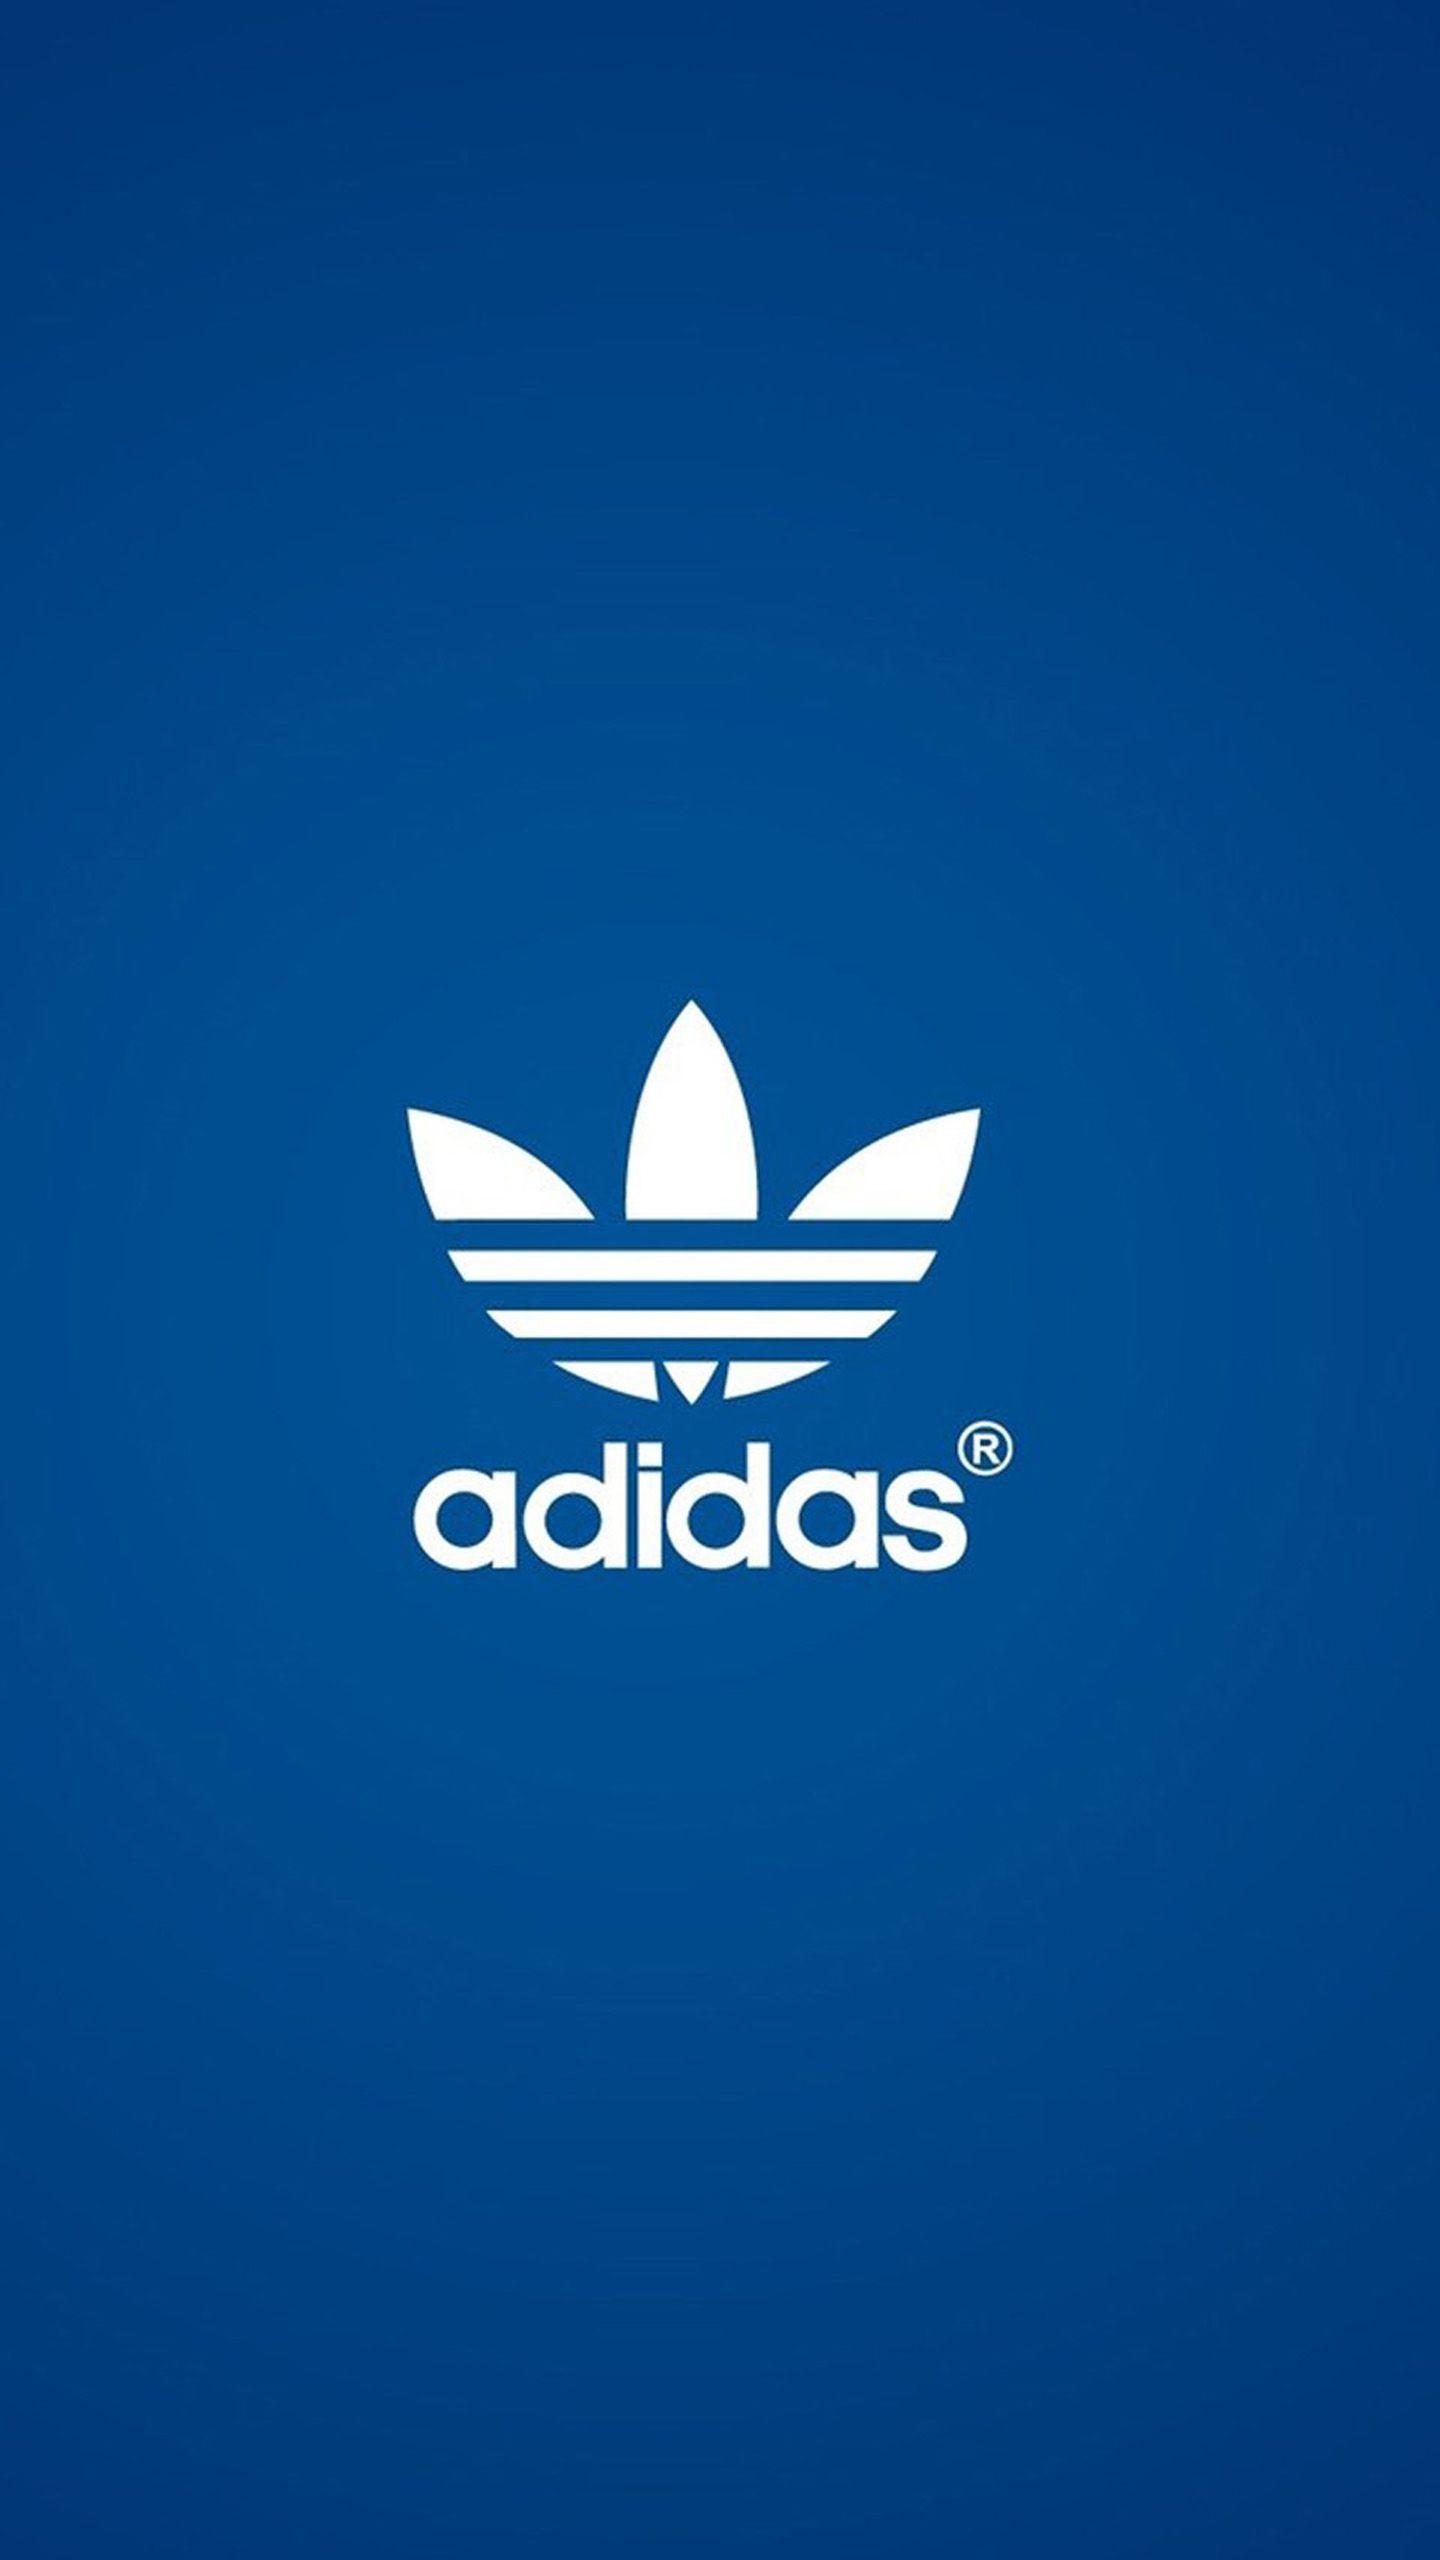 Adidas Samsung Galaxy S8 Wallpaper.